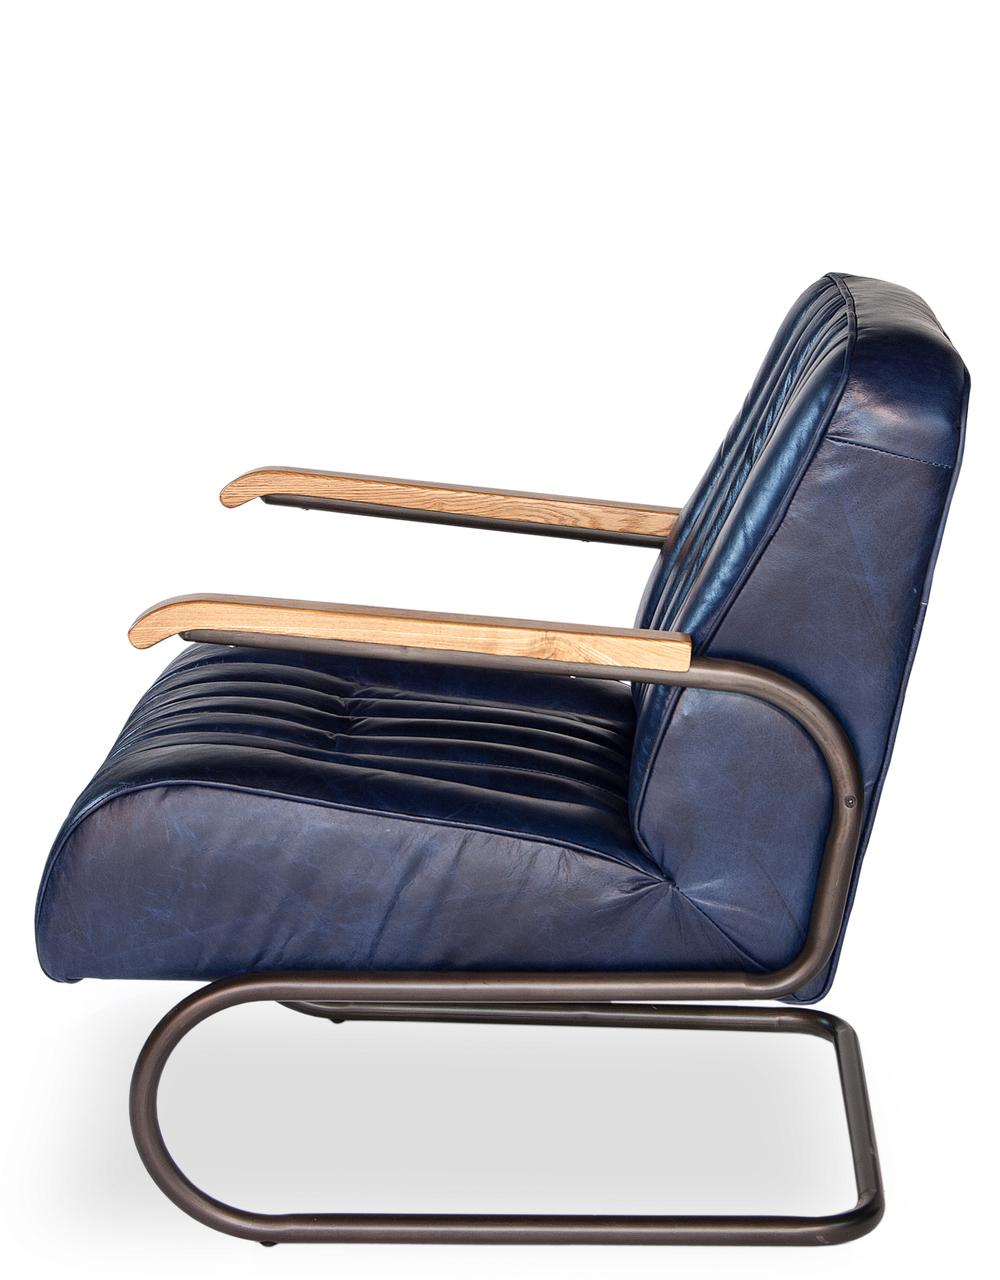 Sarreid - Bel-Air Arm Chair, Blue